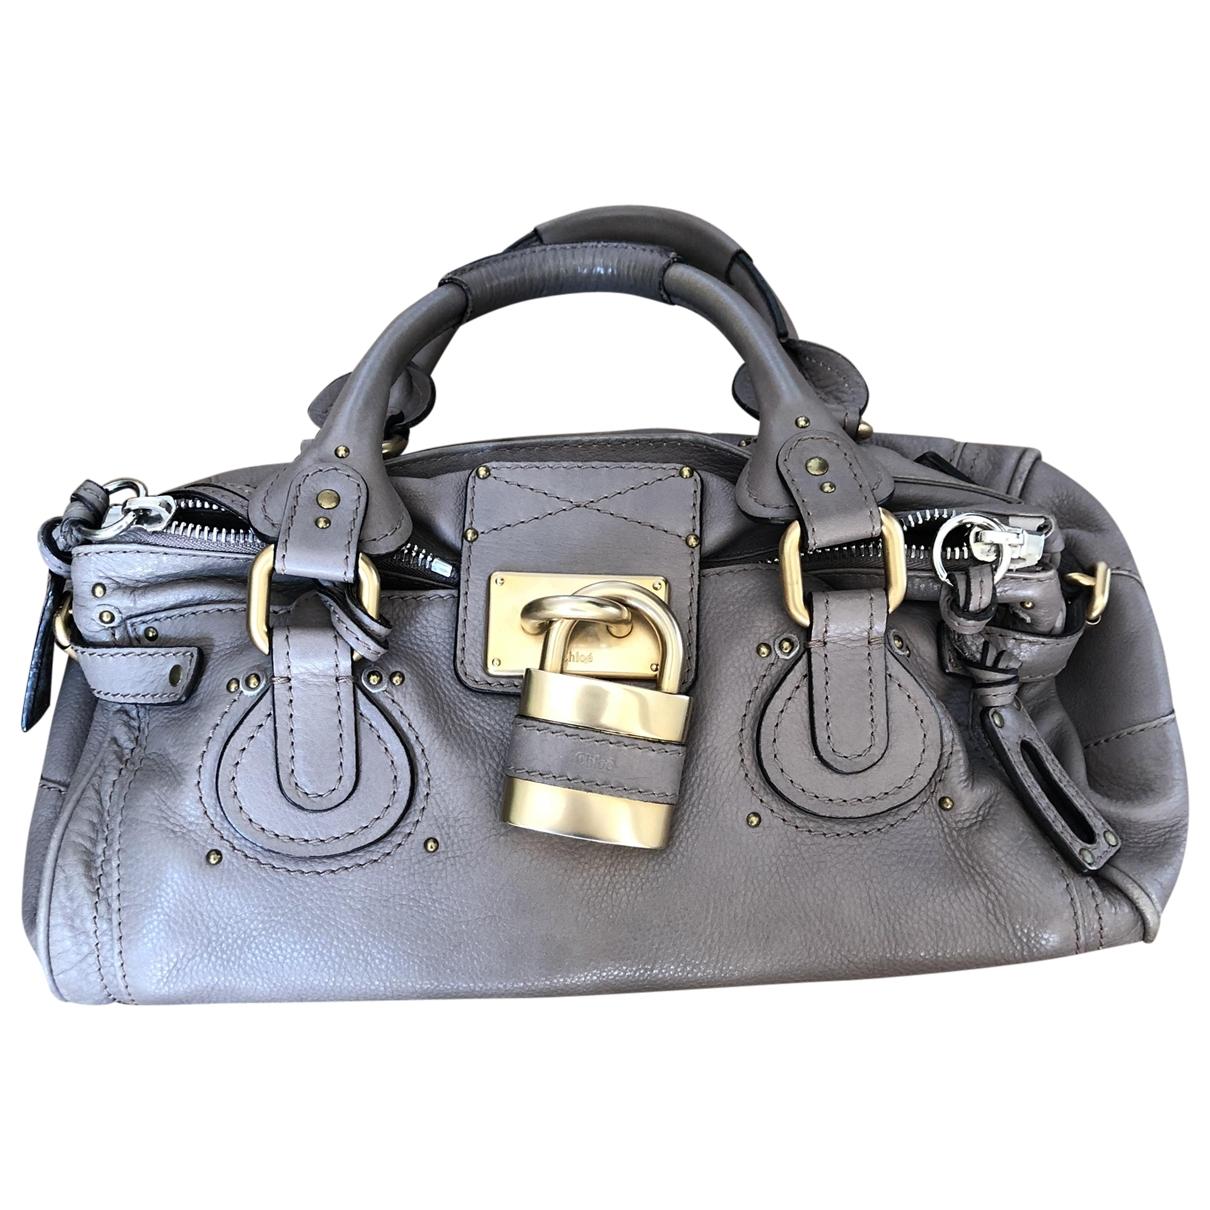 Chloe Paddington Handtasche in  Grau Leder